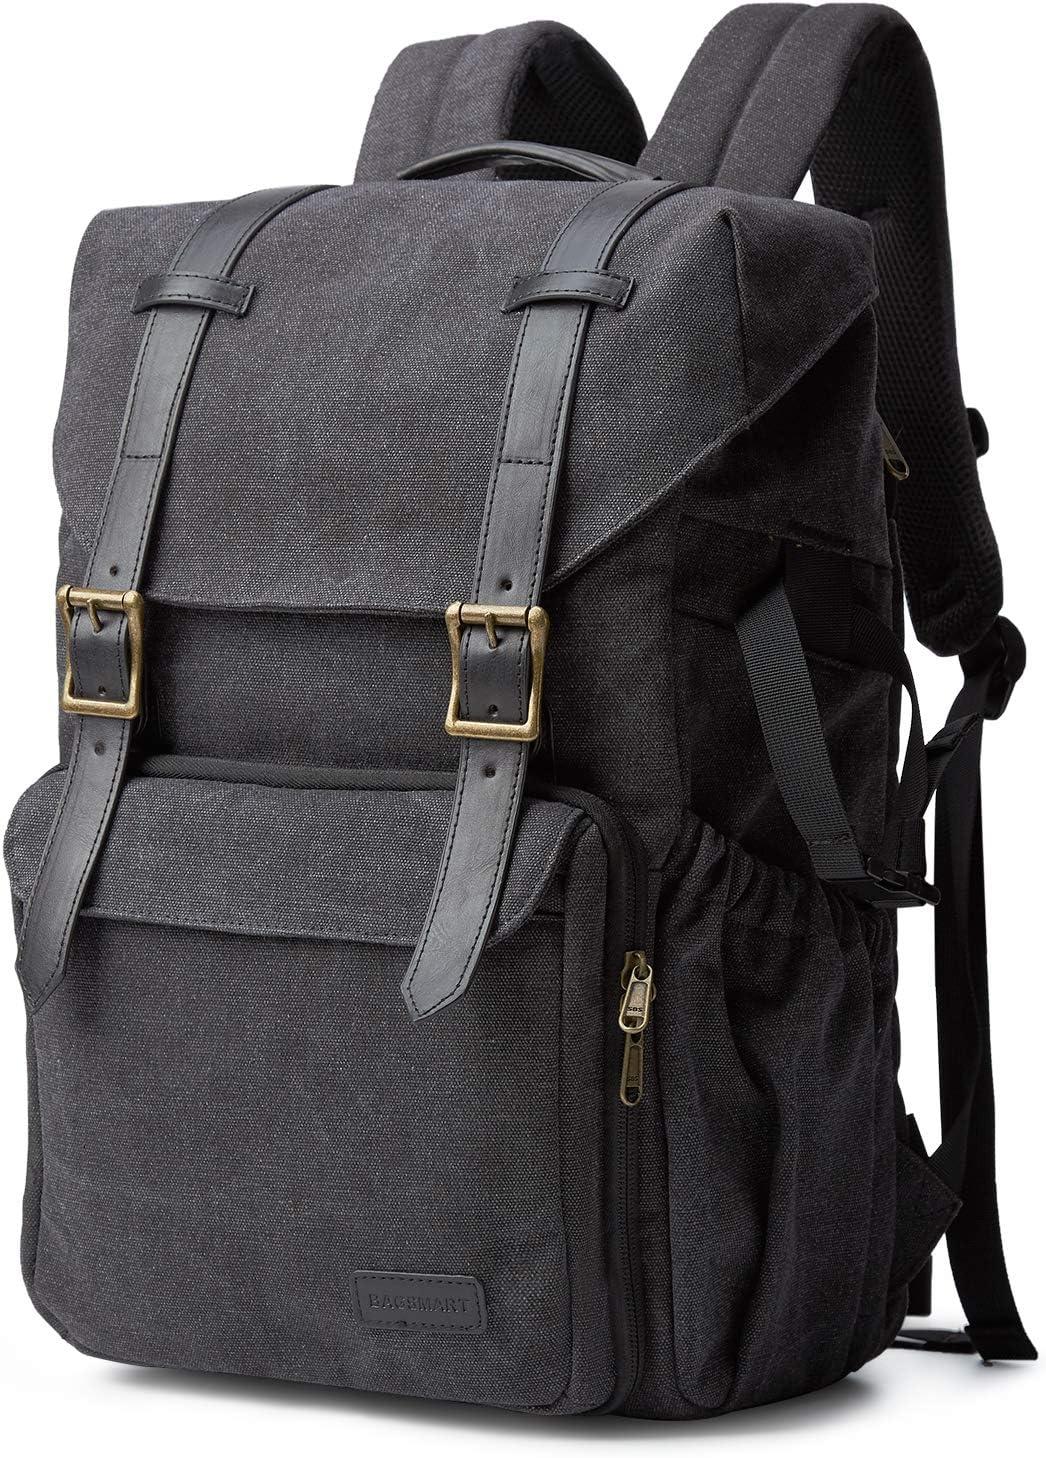 "Camera Backpack, BAGSMART Camera Bag Anti-Theft DSLR SLR Canvas Backpack Fit up to 15"" Laptop with Rain Cover, Tripod Holder for Women and Men (Black-Large)"